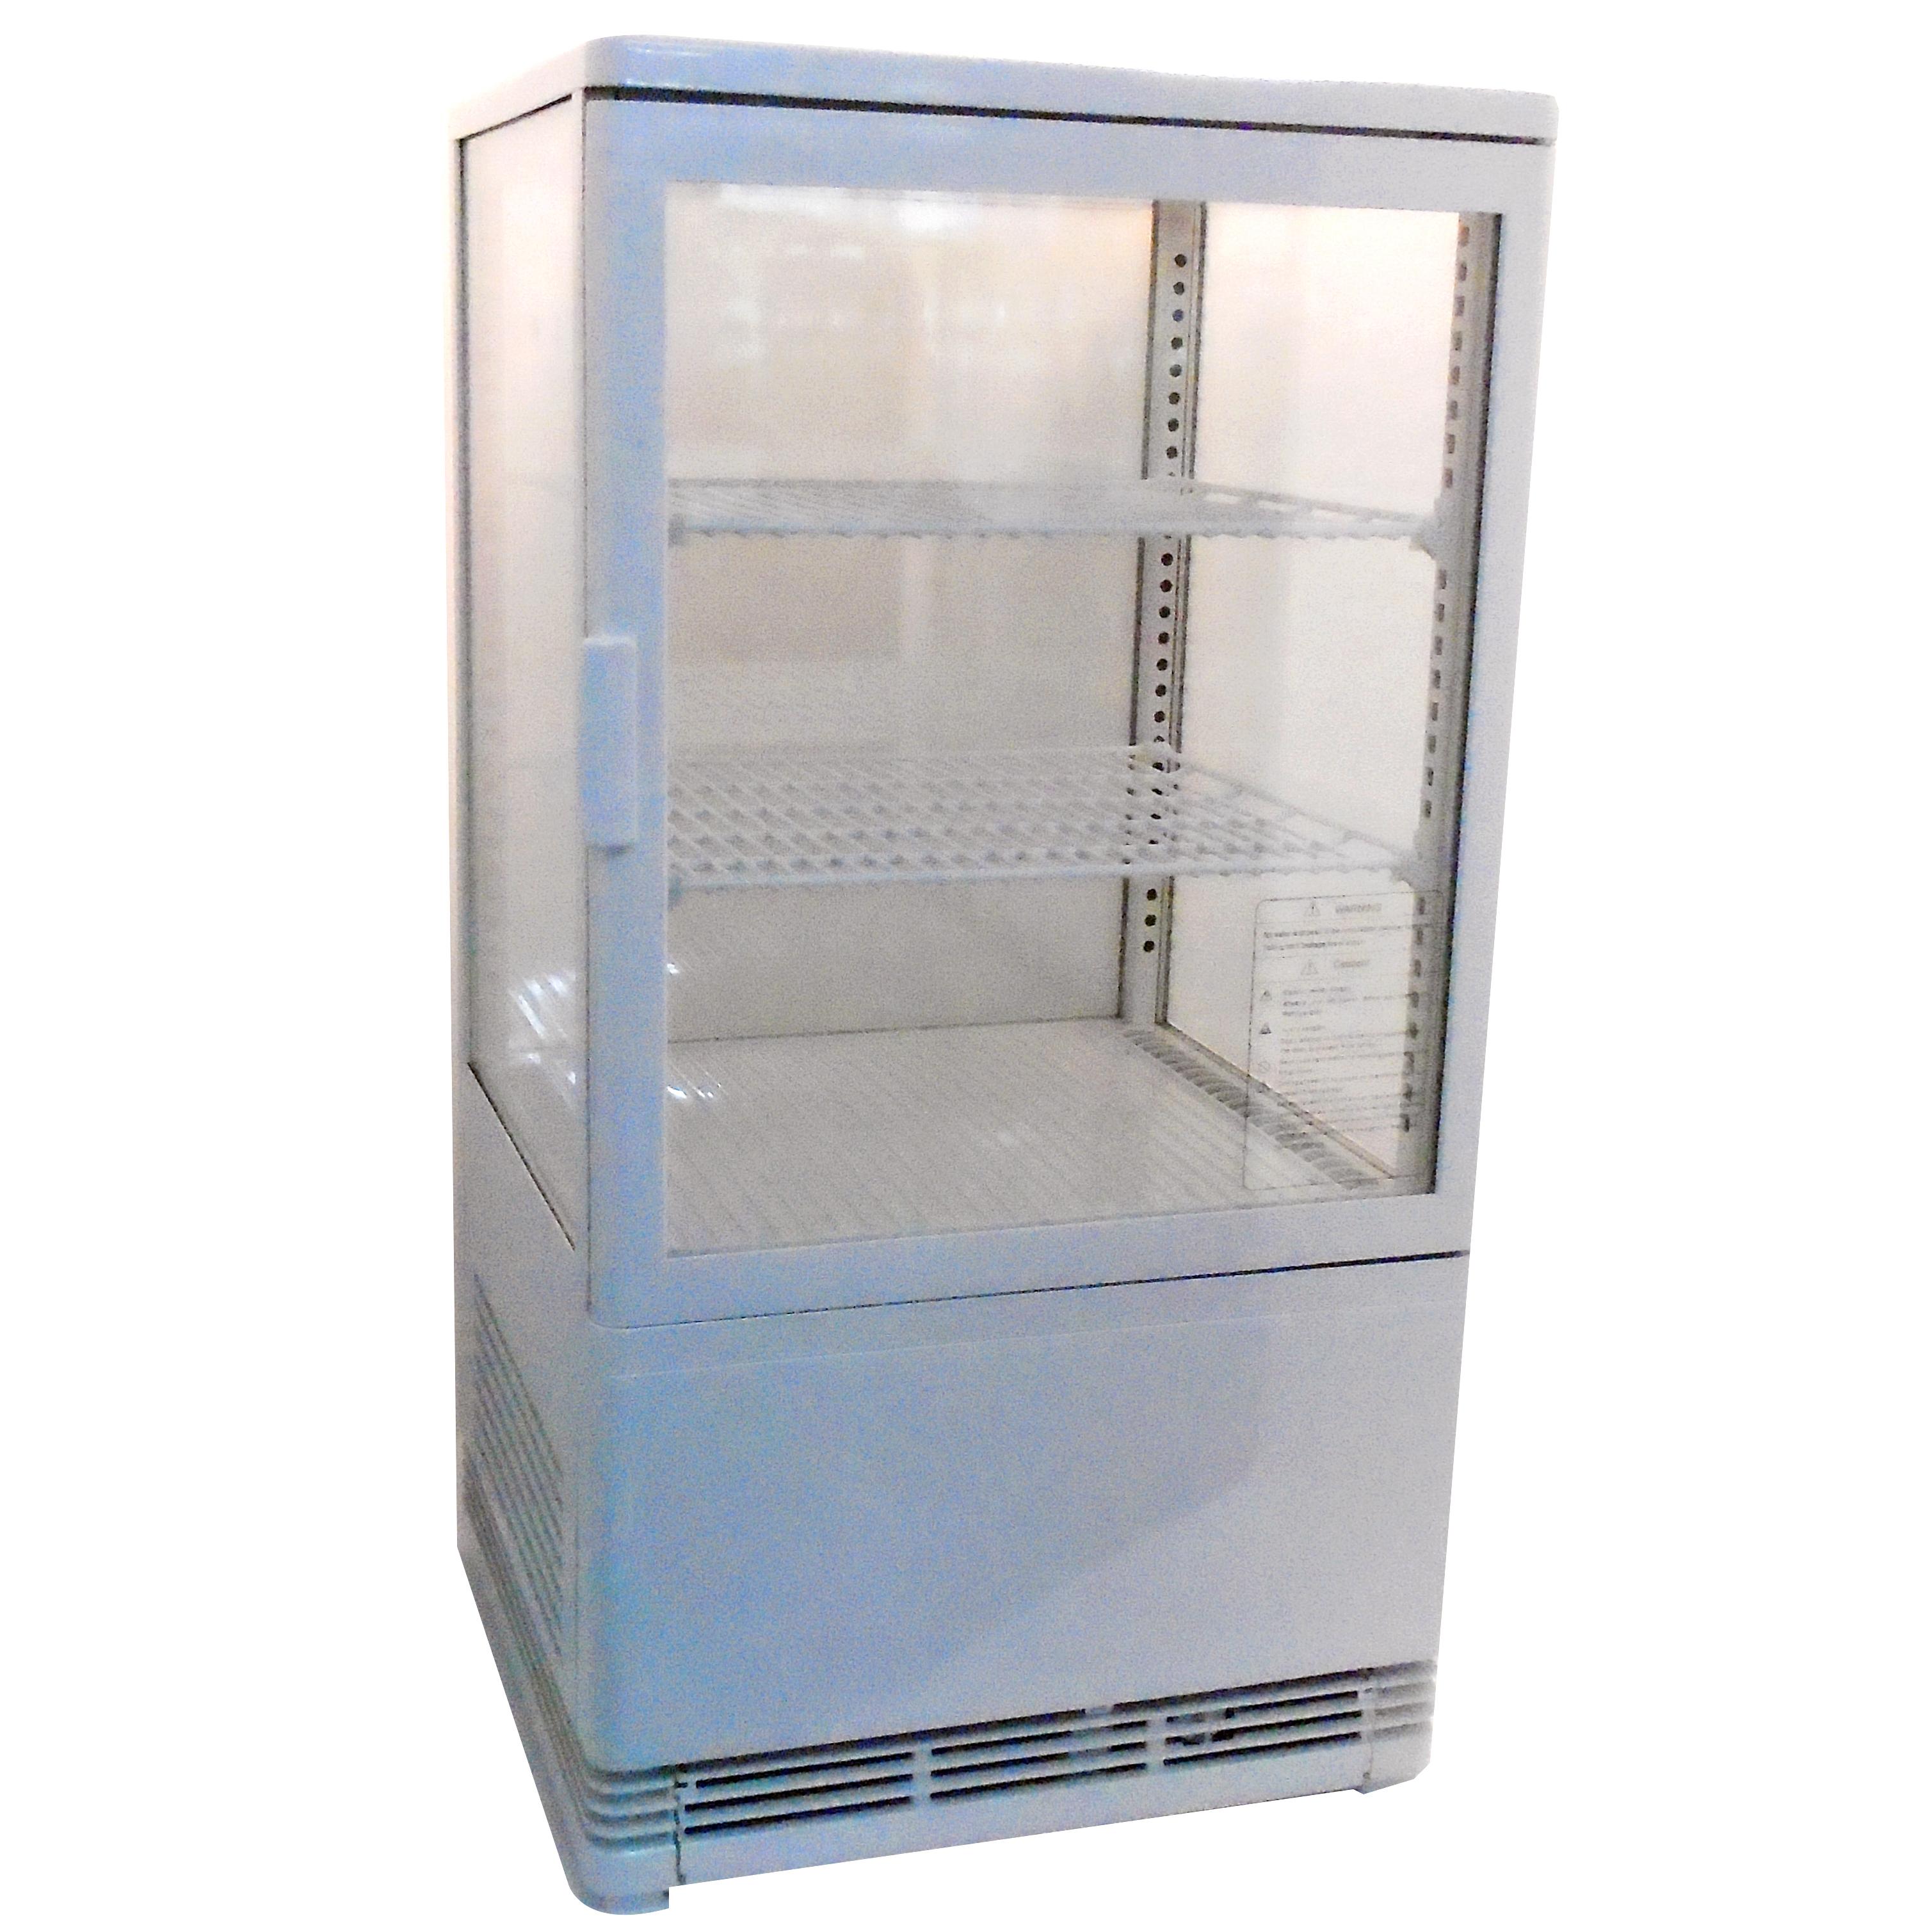 RT-58L White Επιτραπέζιο Επαγγελματικό Ψυγείο Βιτρίνα 58Lit Χρώμα: Λευκό - (ΜxΠx home page   δημοφιλή  επαγγελματικός εξοπλισμός   επαγγελματικά ψυγεία   βιτρινά